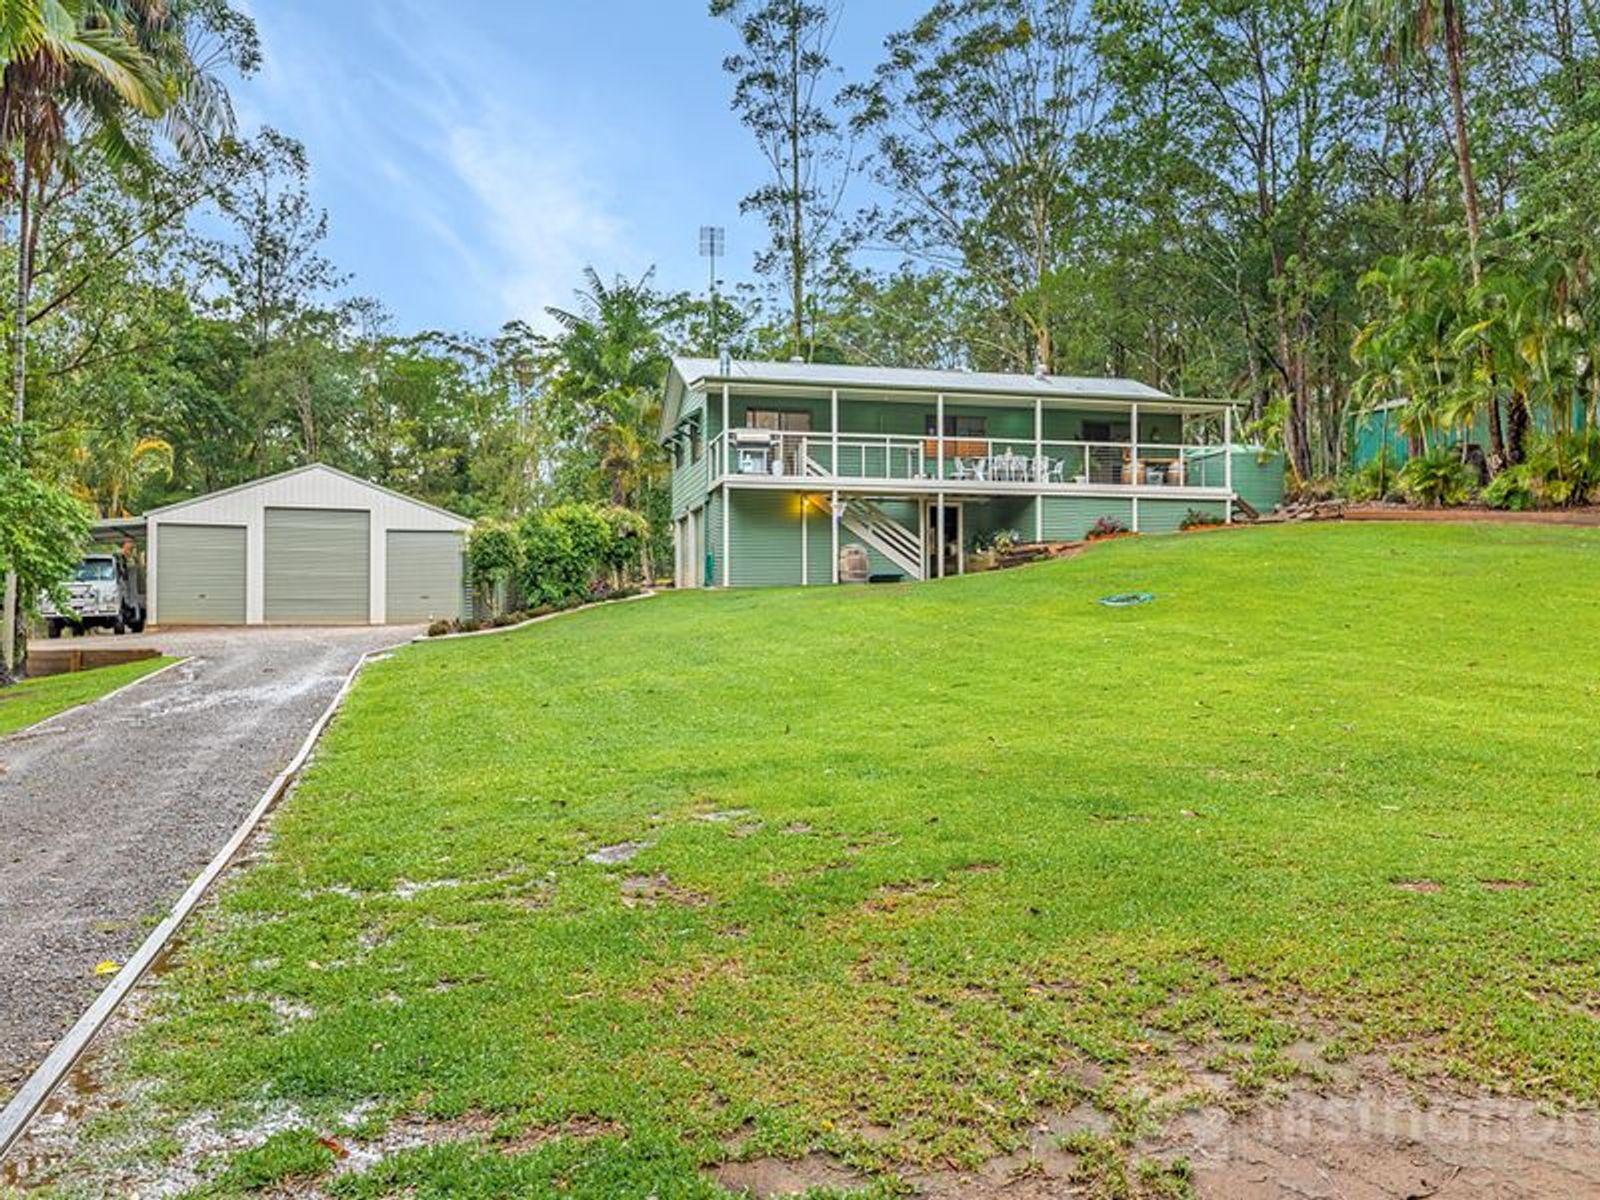 231 Old Peachester Road, Peachester, QLD 4519